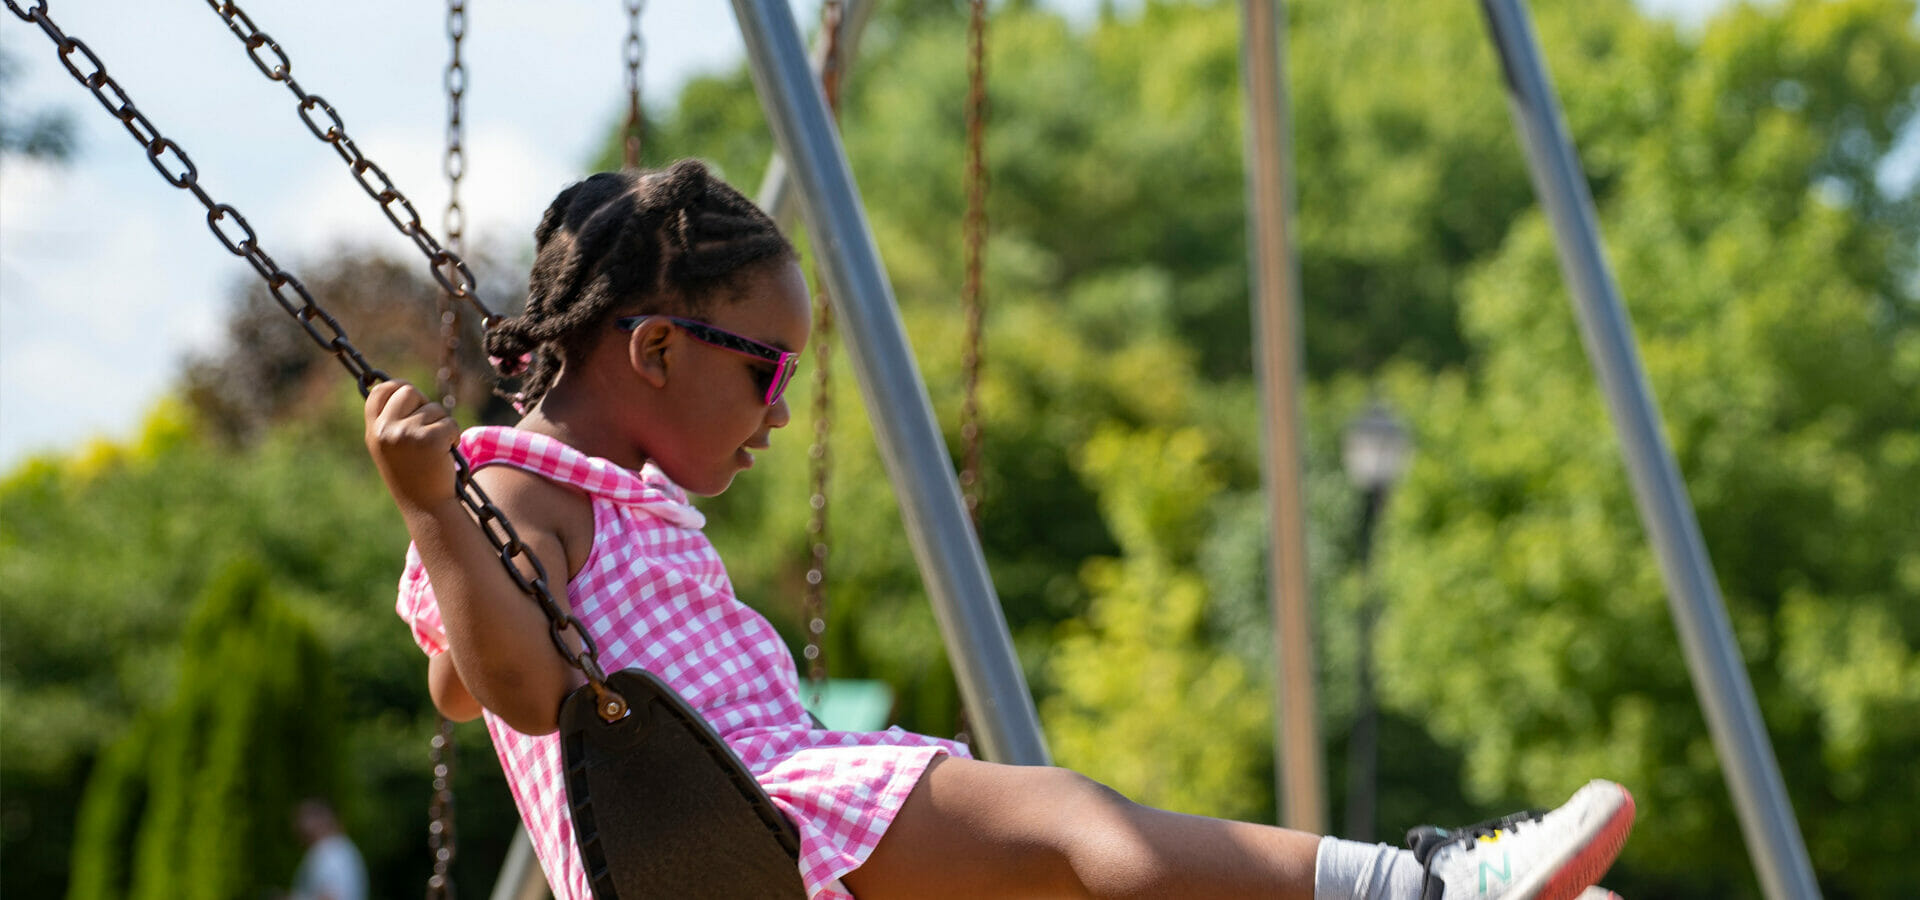 girl playing on swing